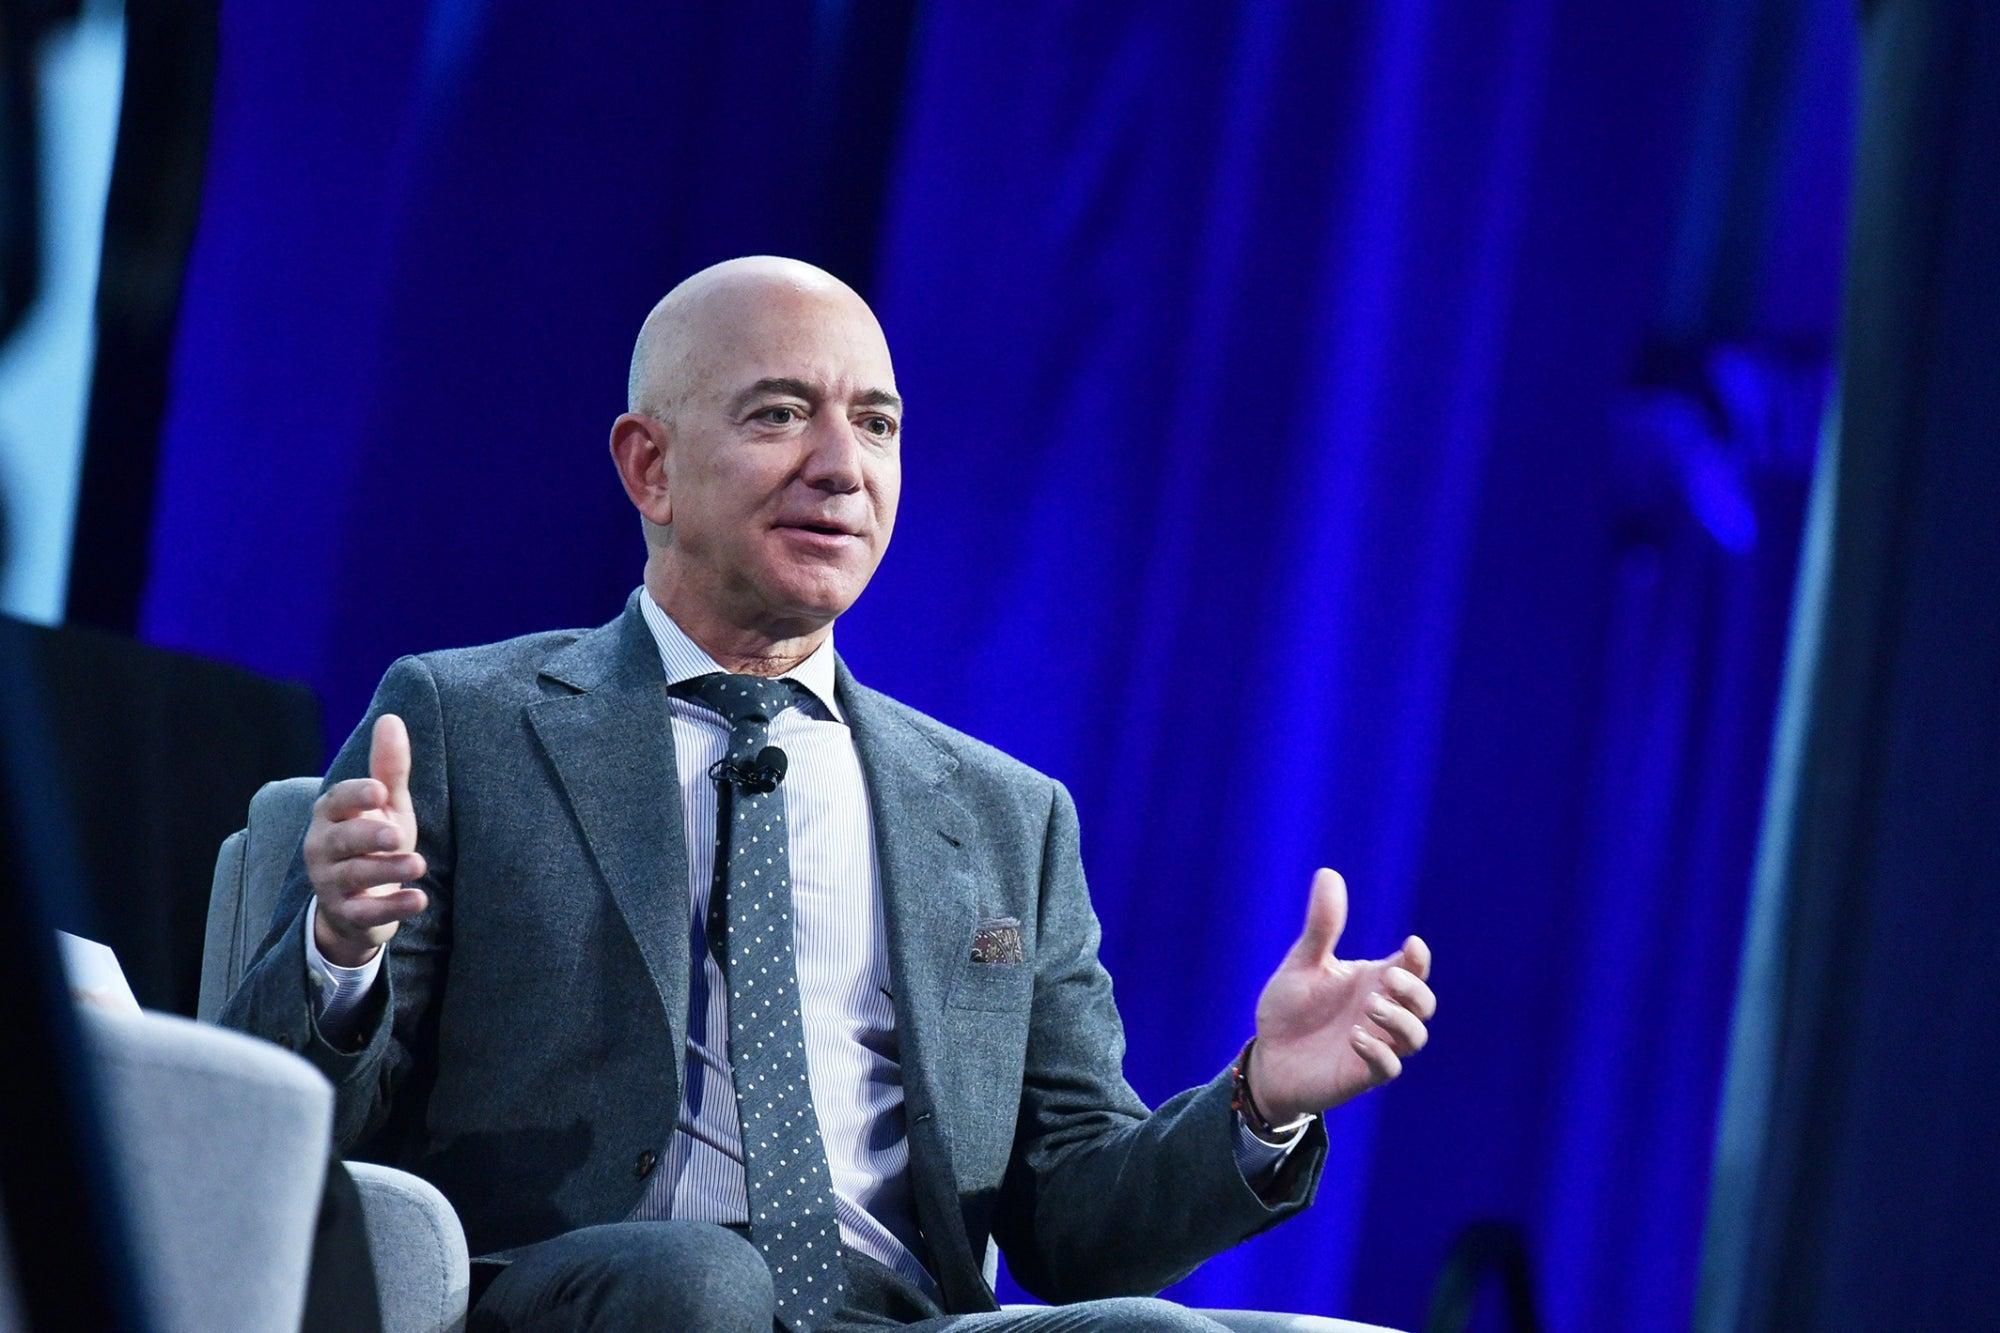 Jeff Bezos Sends Rare Message to Elon Musk in First Tweet Since February 2020